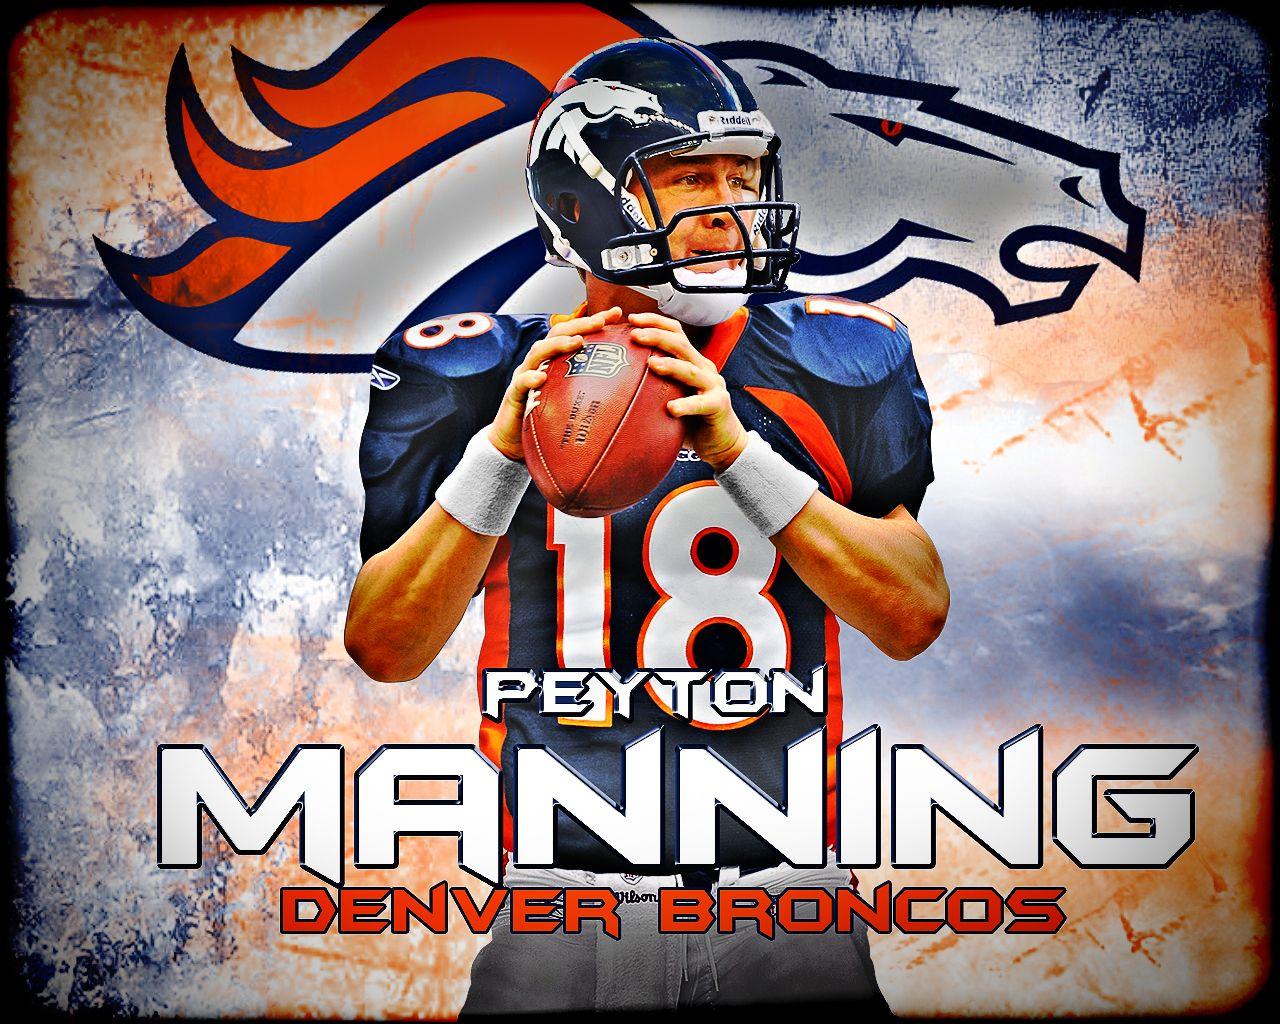 free+images+of+denver+broncos NFL Wallpapers Peyton